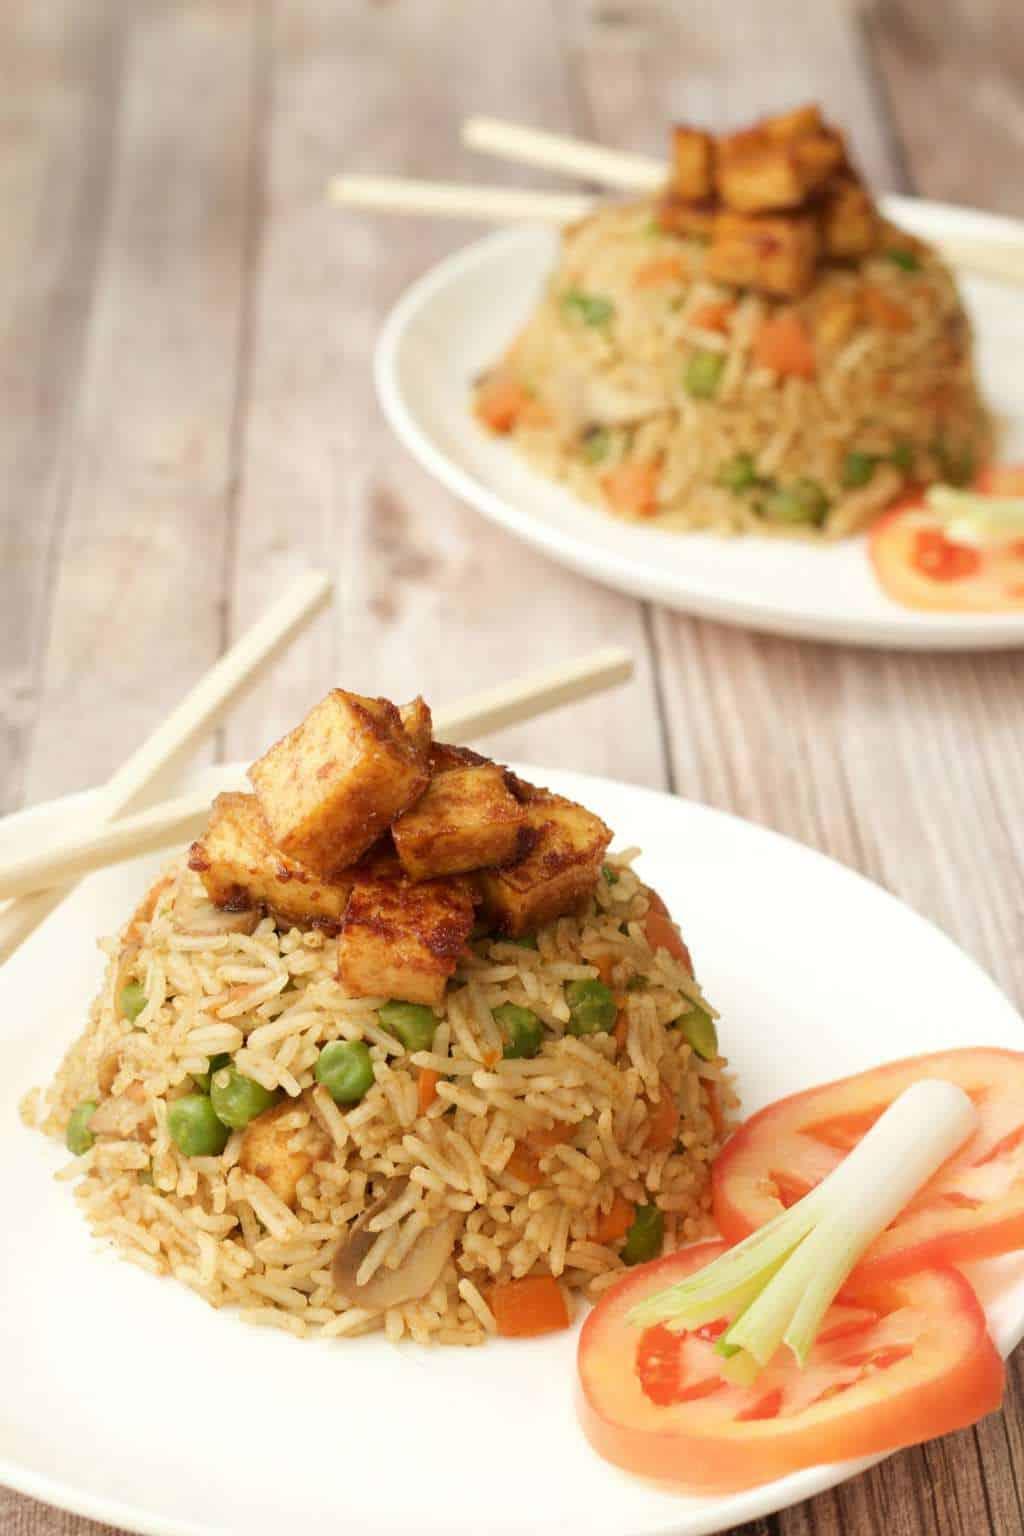 Green Curry Fried Rice with Crispy Baked Tofu #vegan #lovingitvegan #entree #dinner #thai